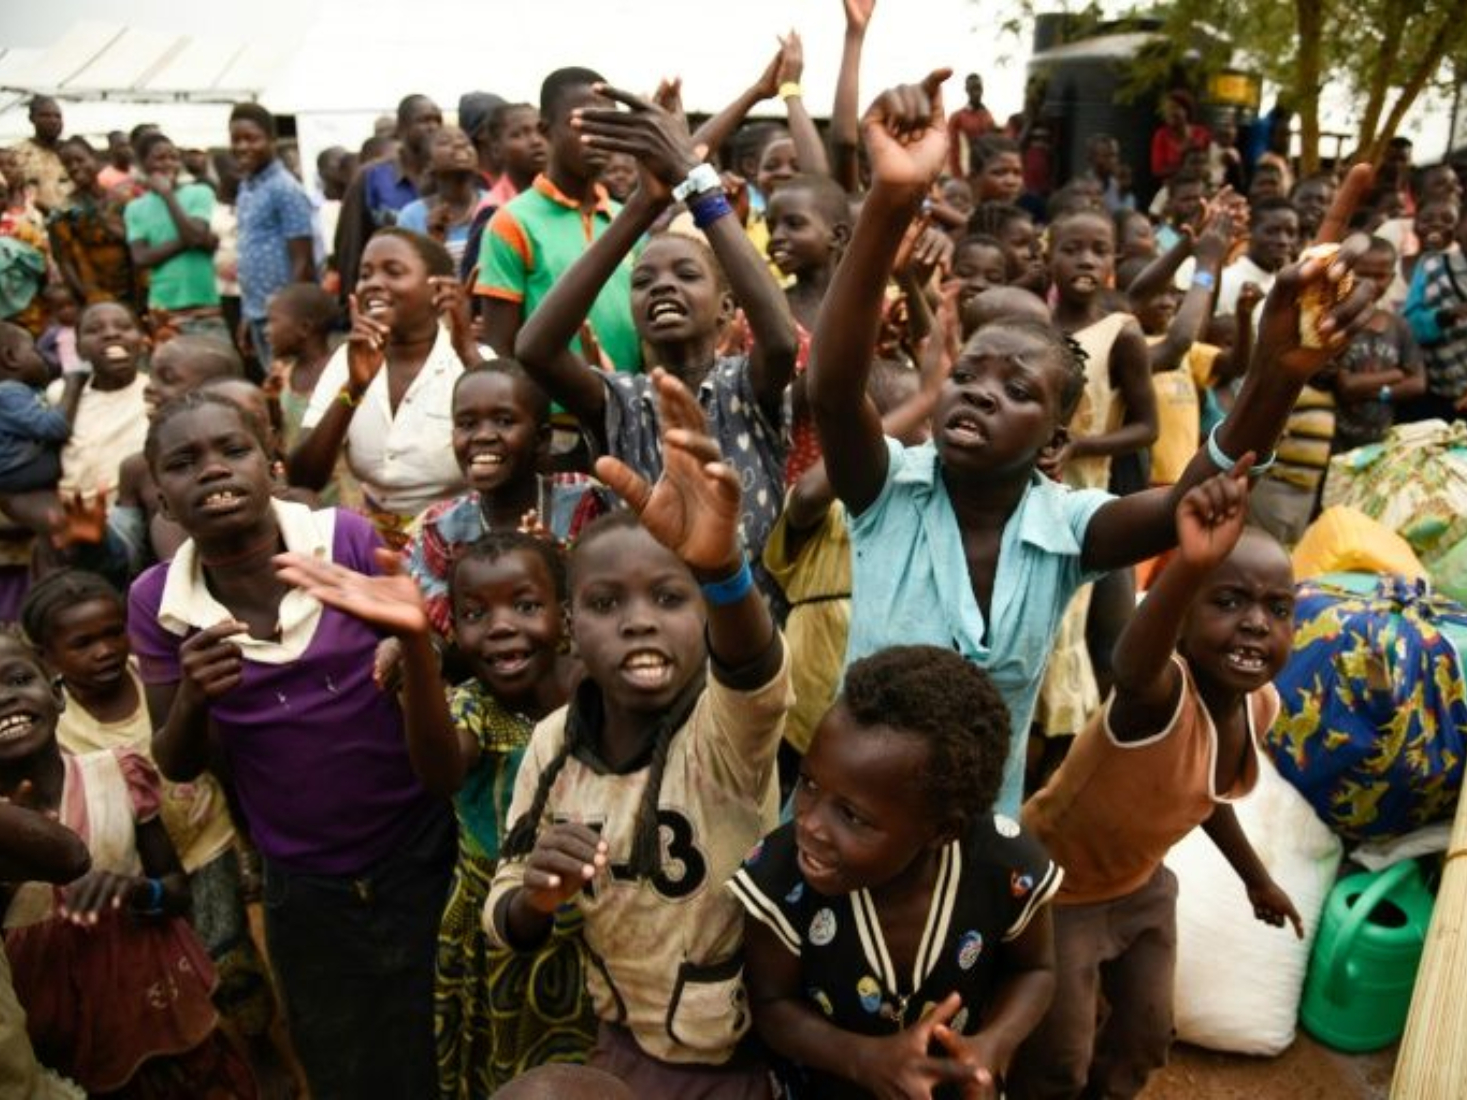 US to further slash refugee resettlement program, citing 'crisis'